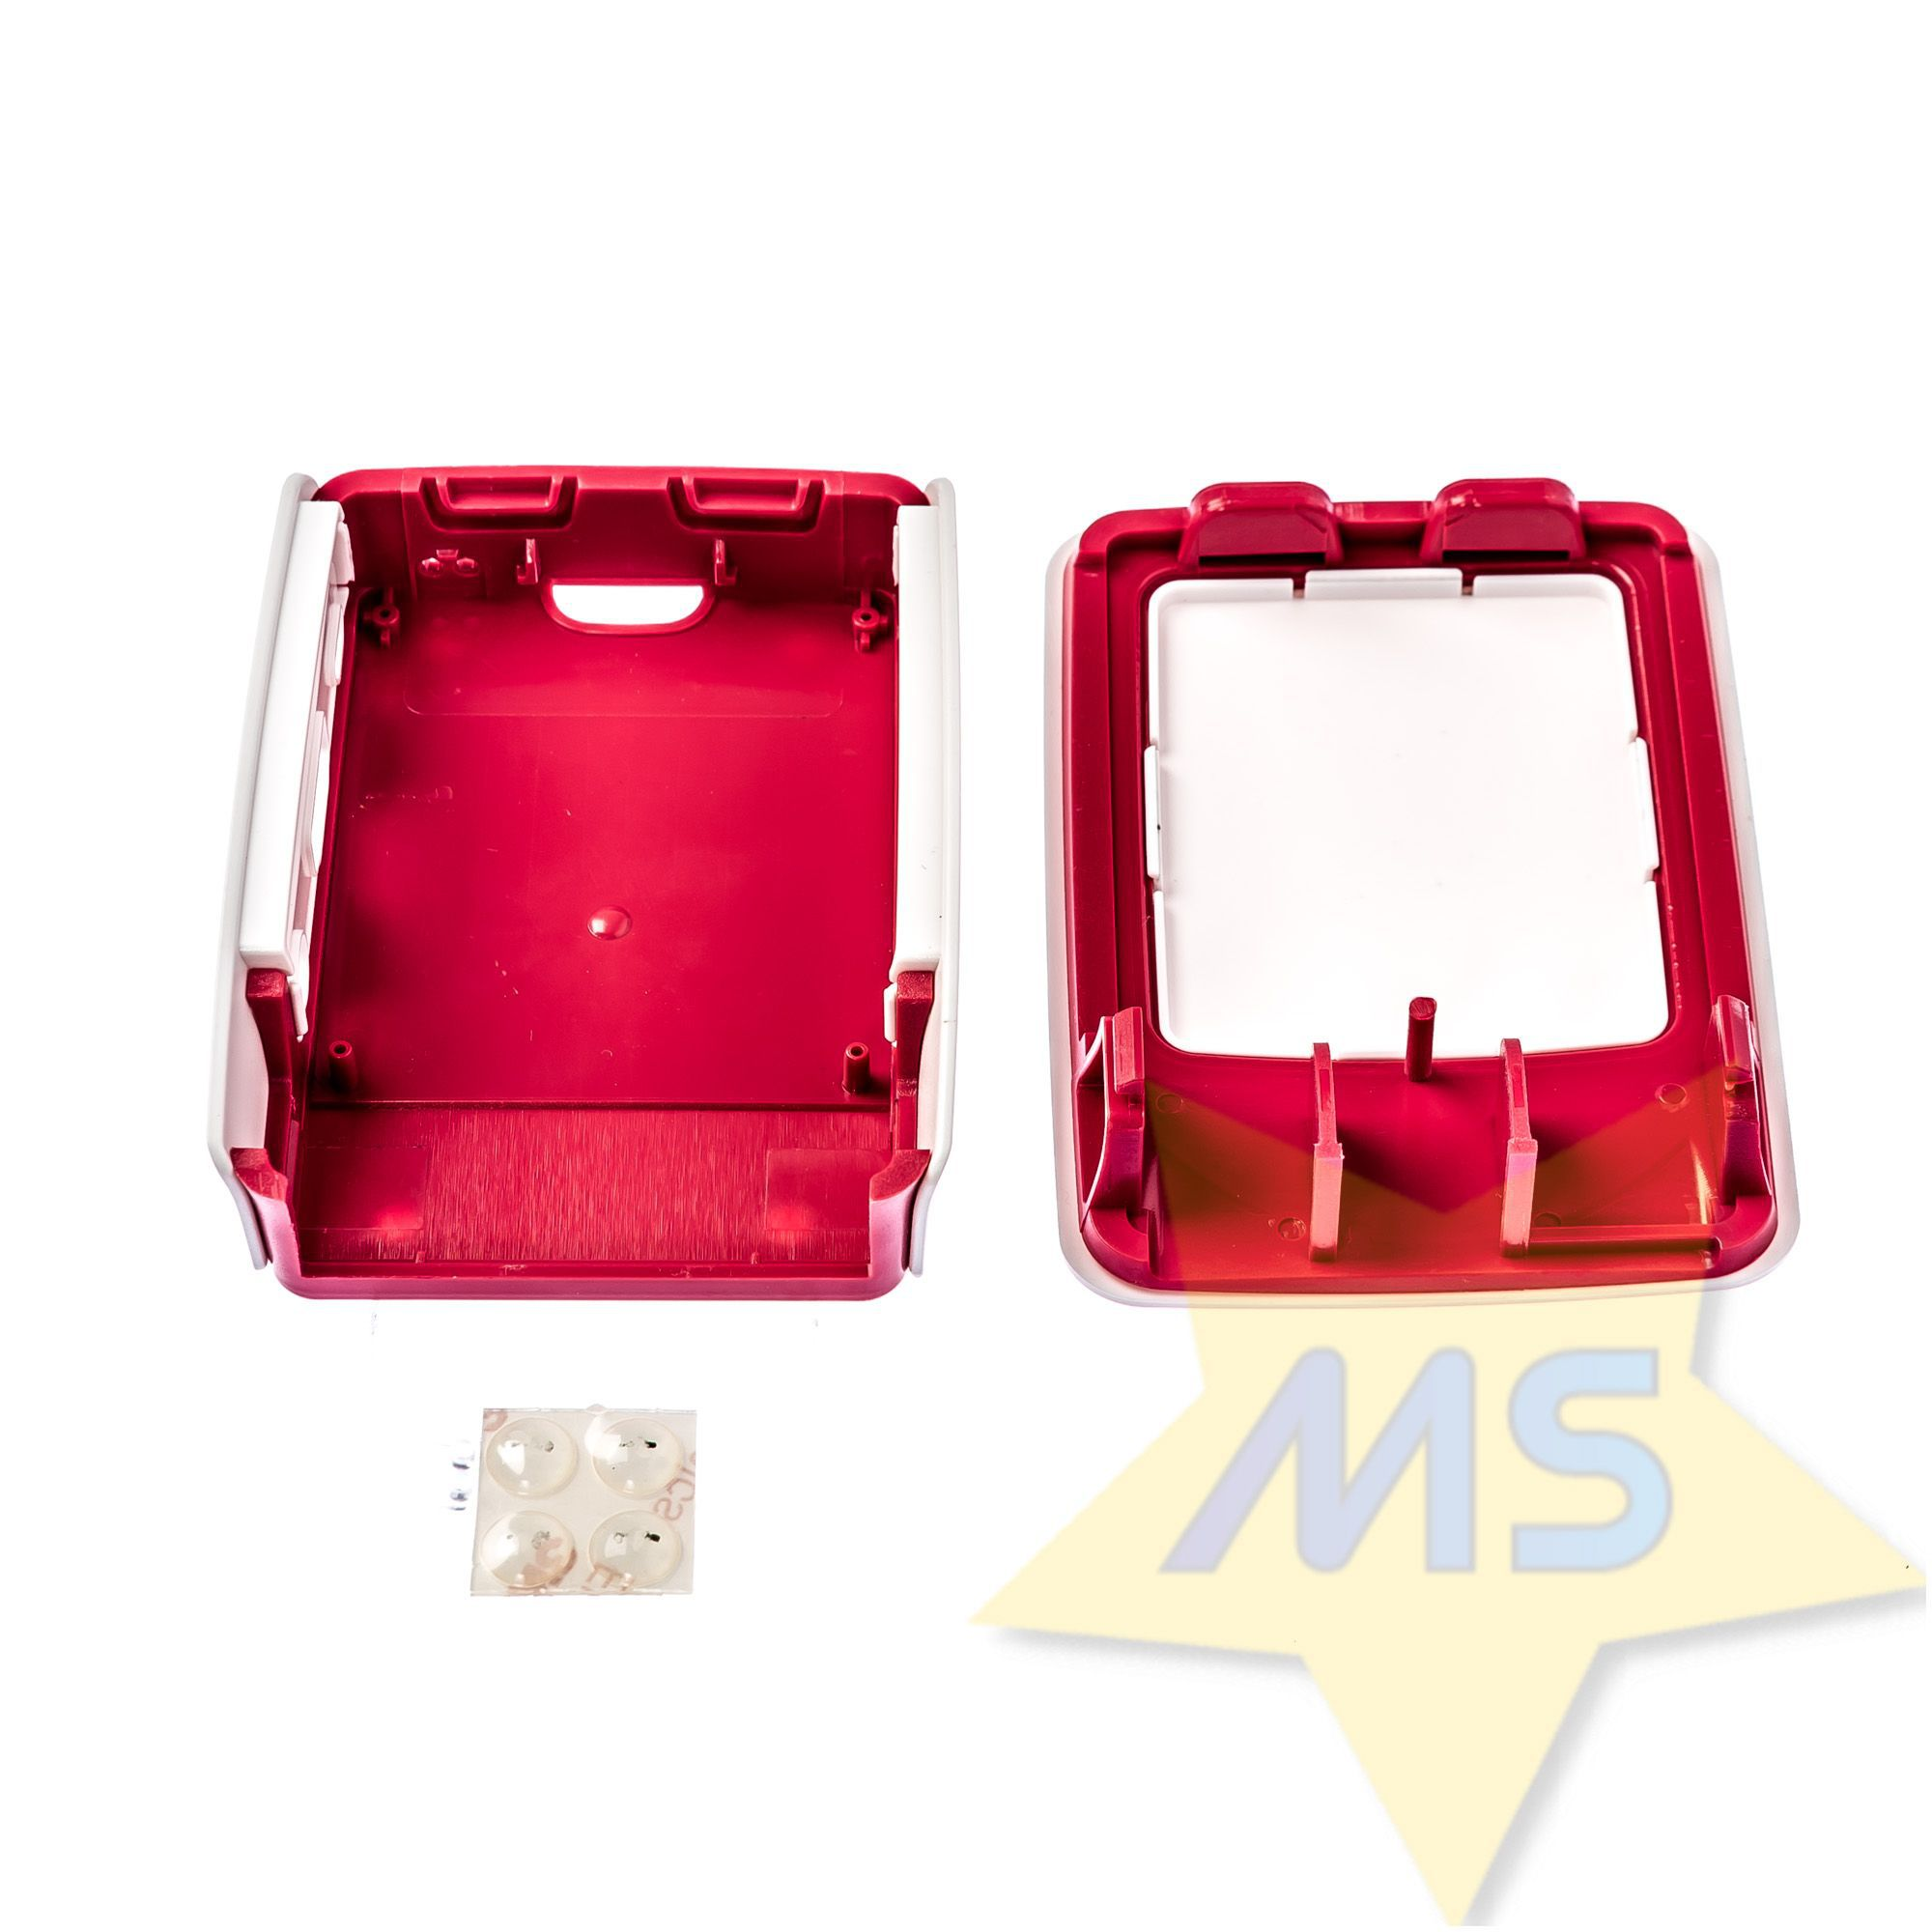 Case Raspberry Pi 3 Oficial